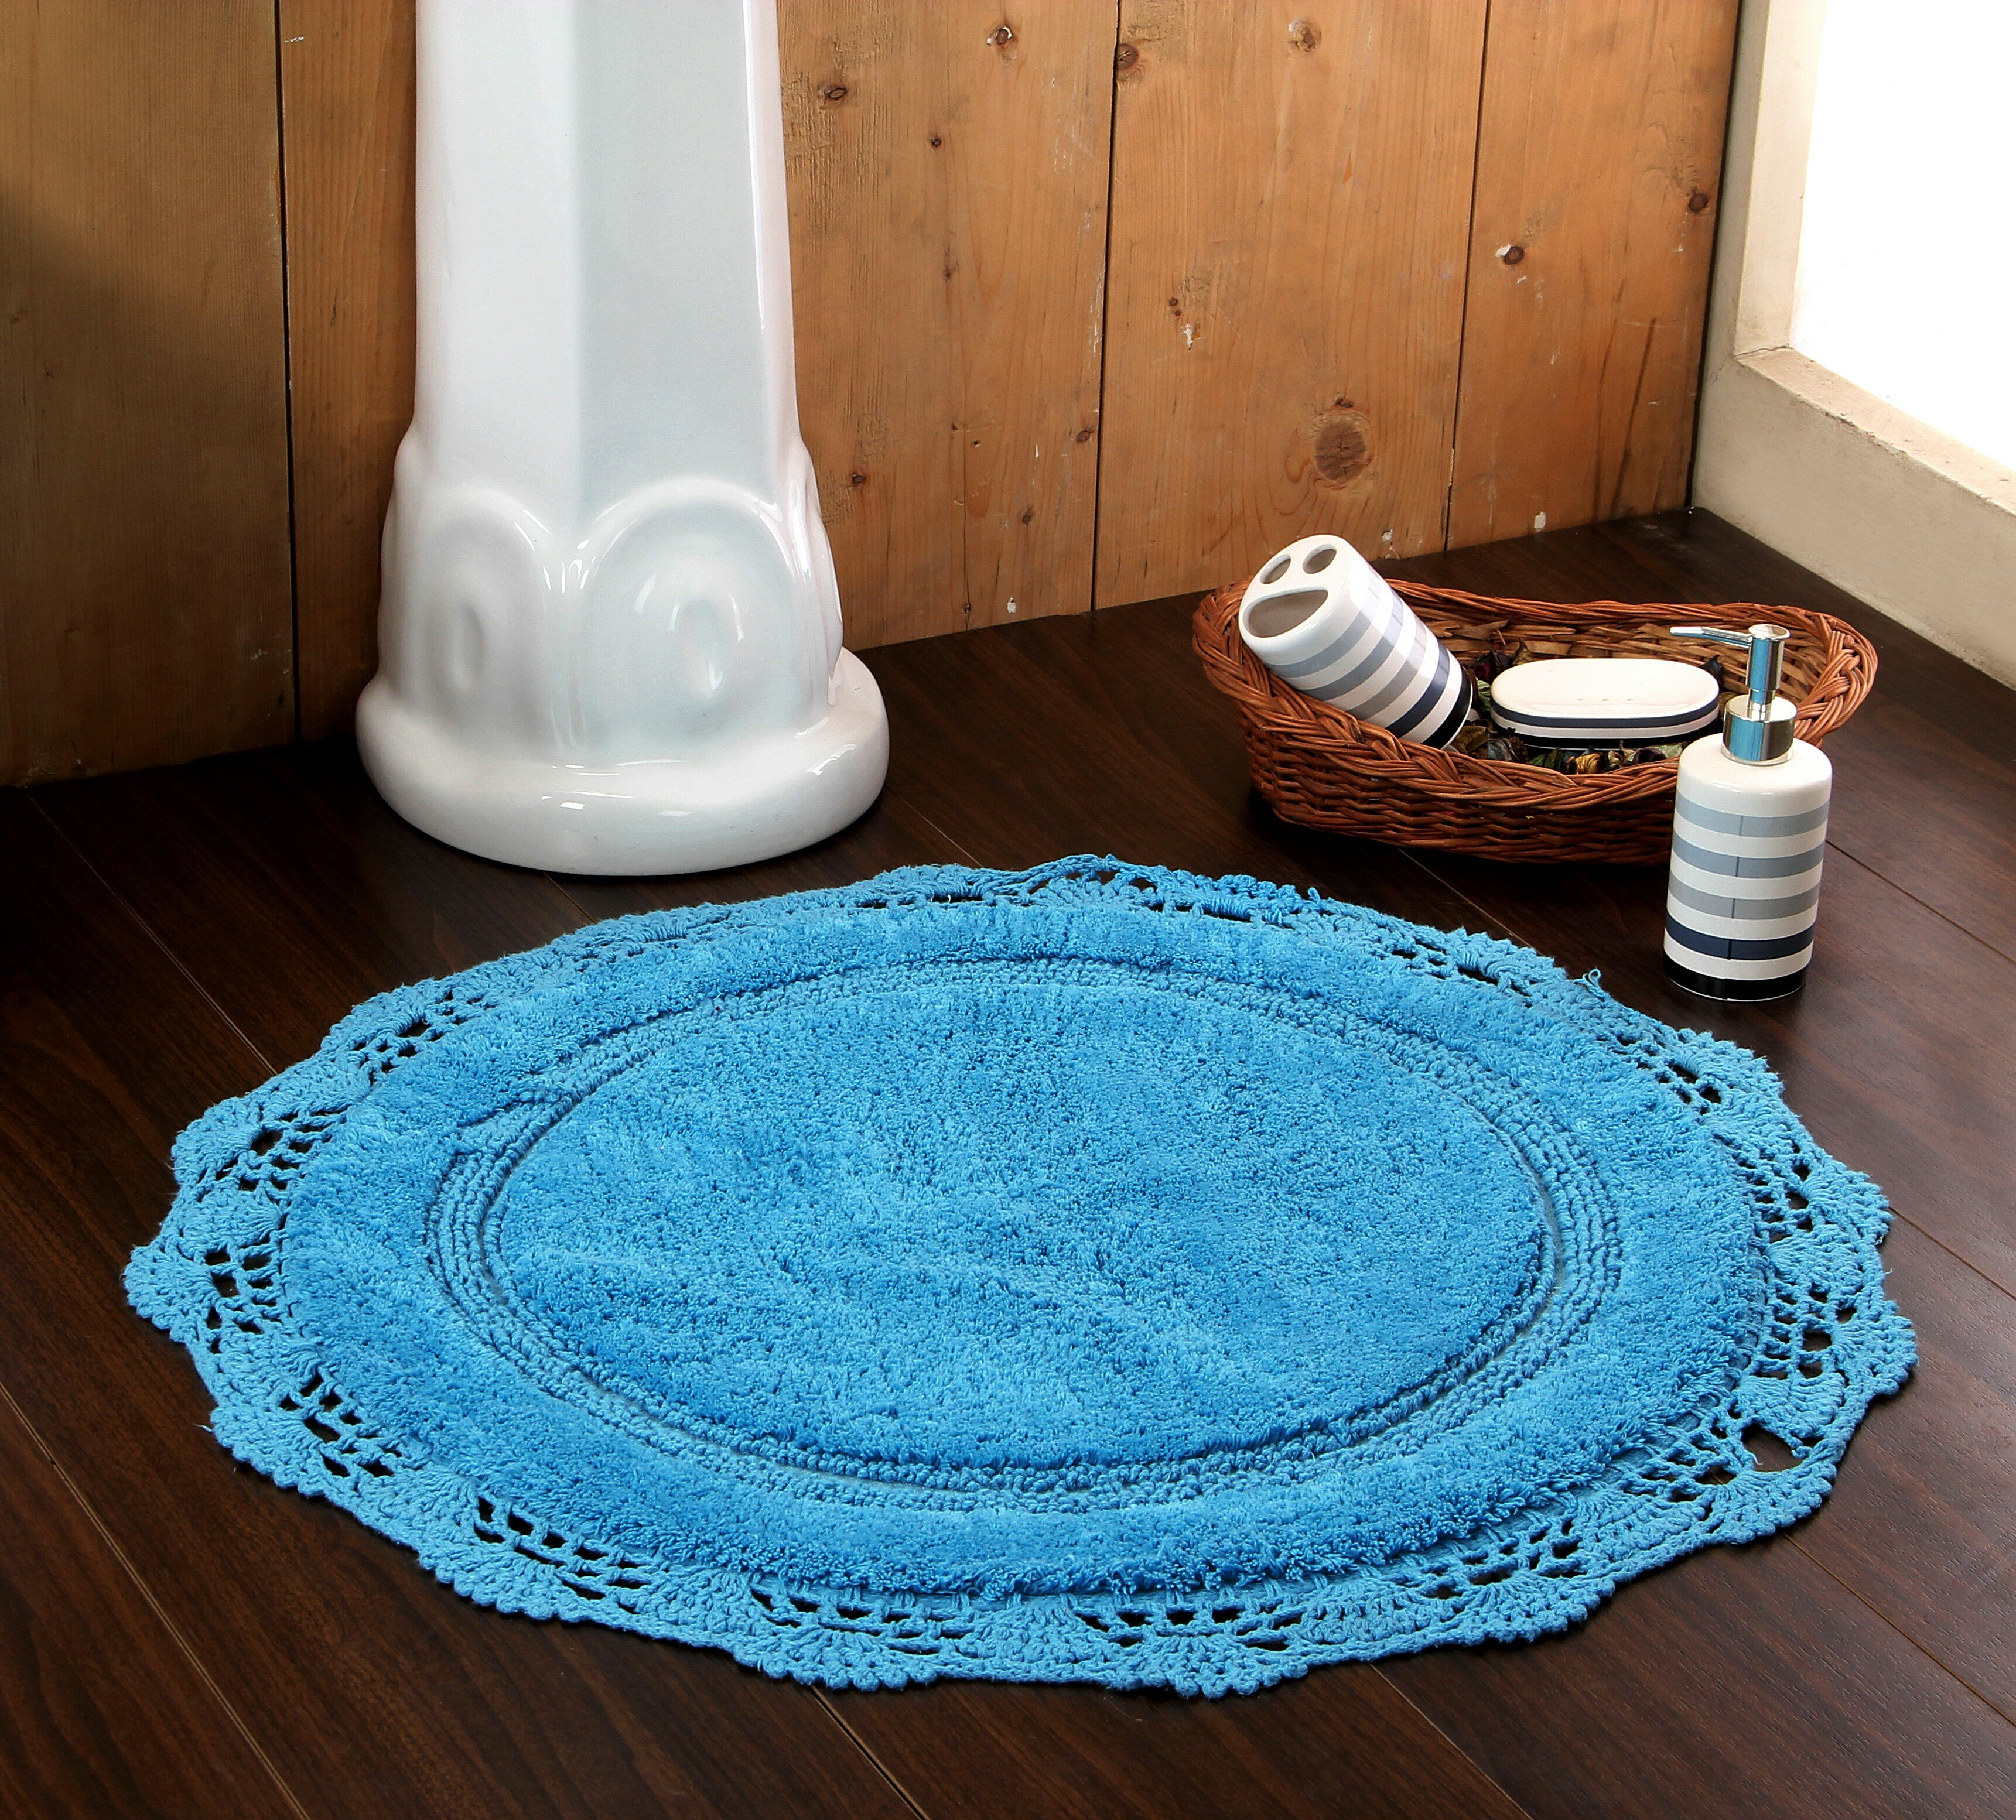 Ophelia Co Wingert Round Crochet Designer Circle 100 Cotton Non Slip Bath Rug Reviews Wayfair